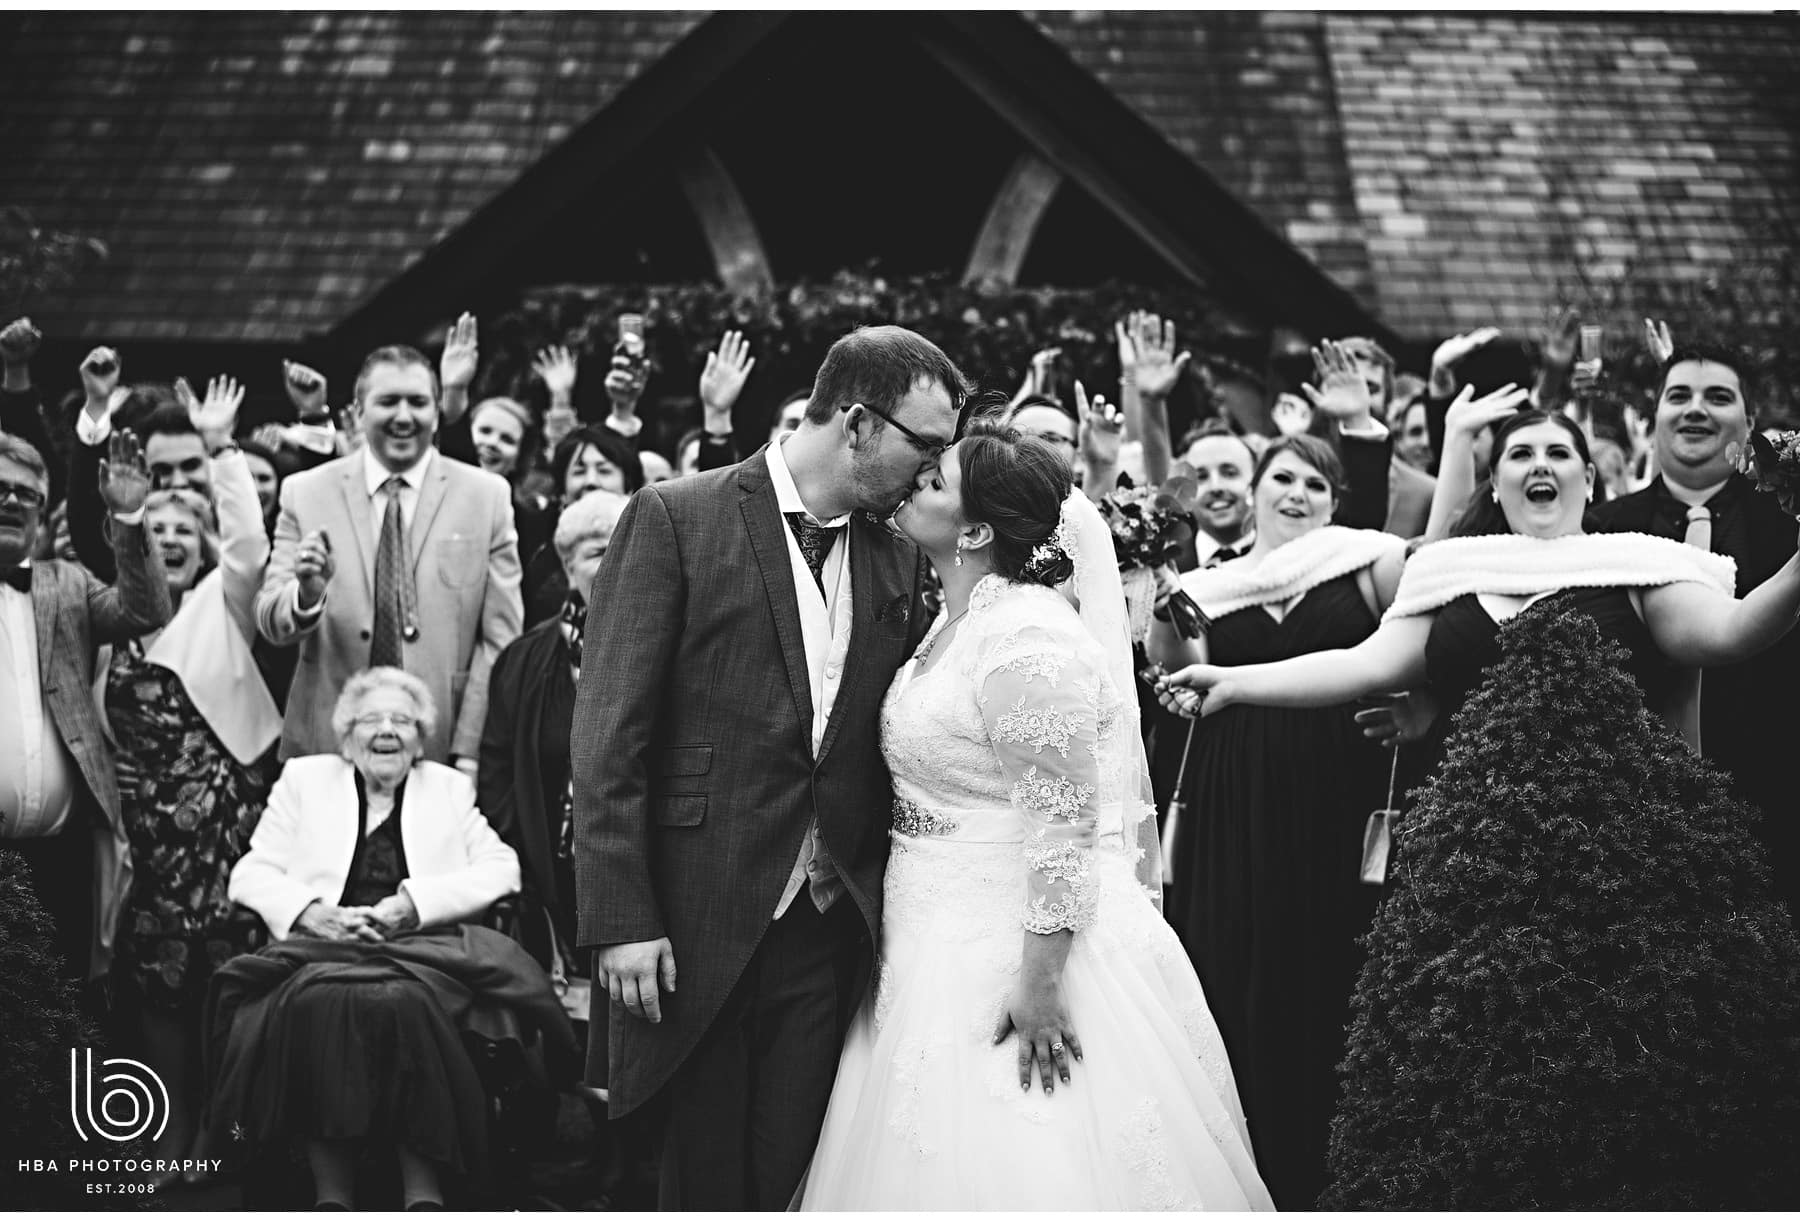 the bride & groom kissing